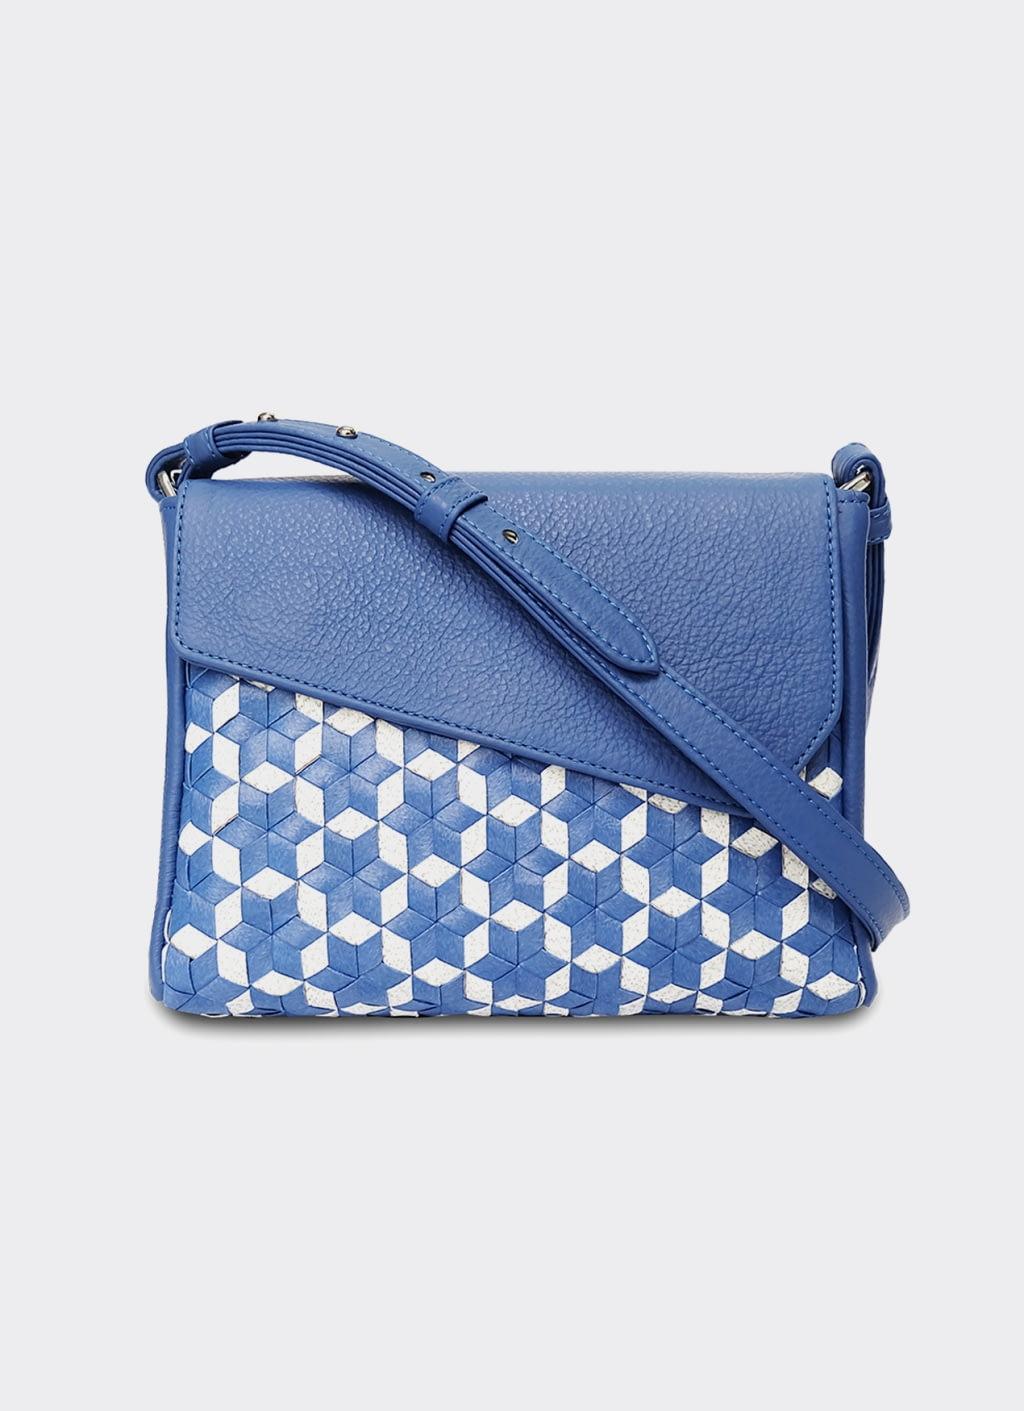 Chameo Couture Blue Matisse Choo Sling Bag